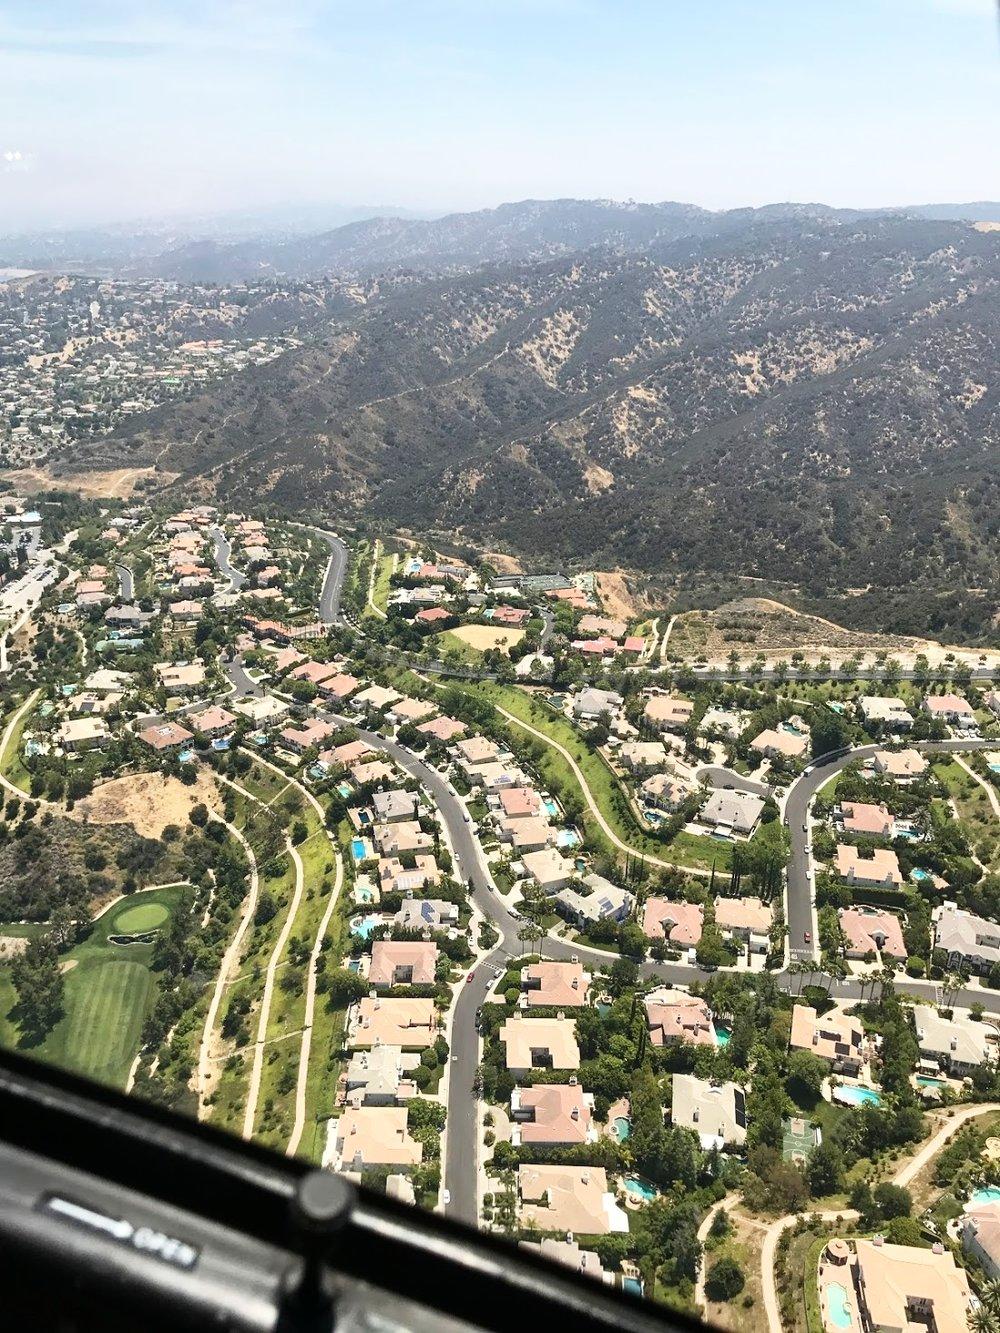 Kevin Hart's neighborhood